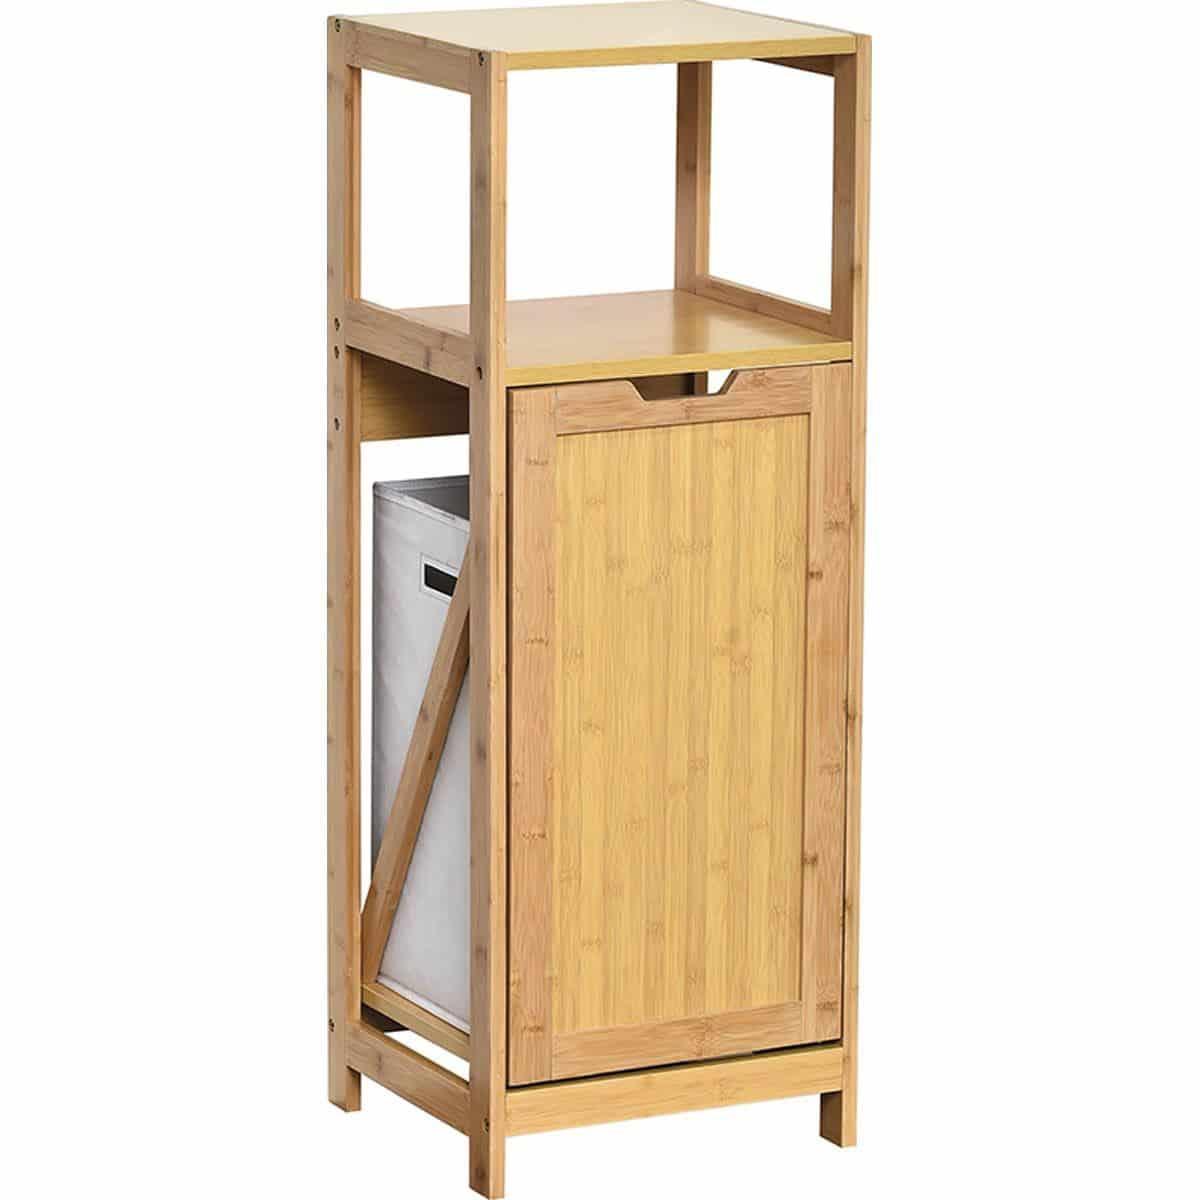 4Goodz Mahe staand badkamerrek 33x36x98 cm met wasmand